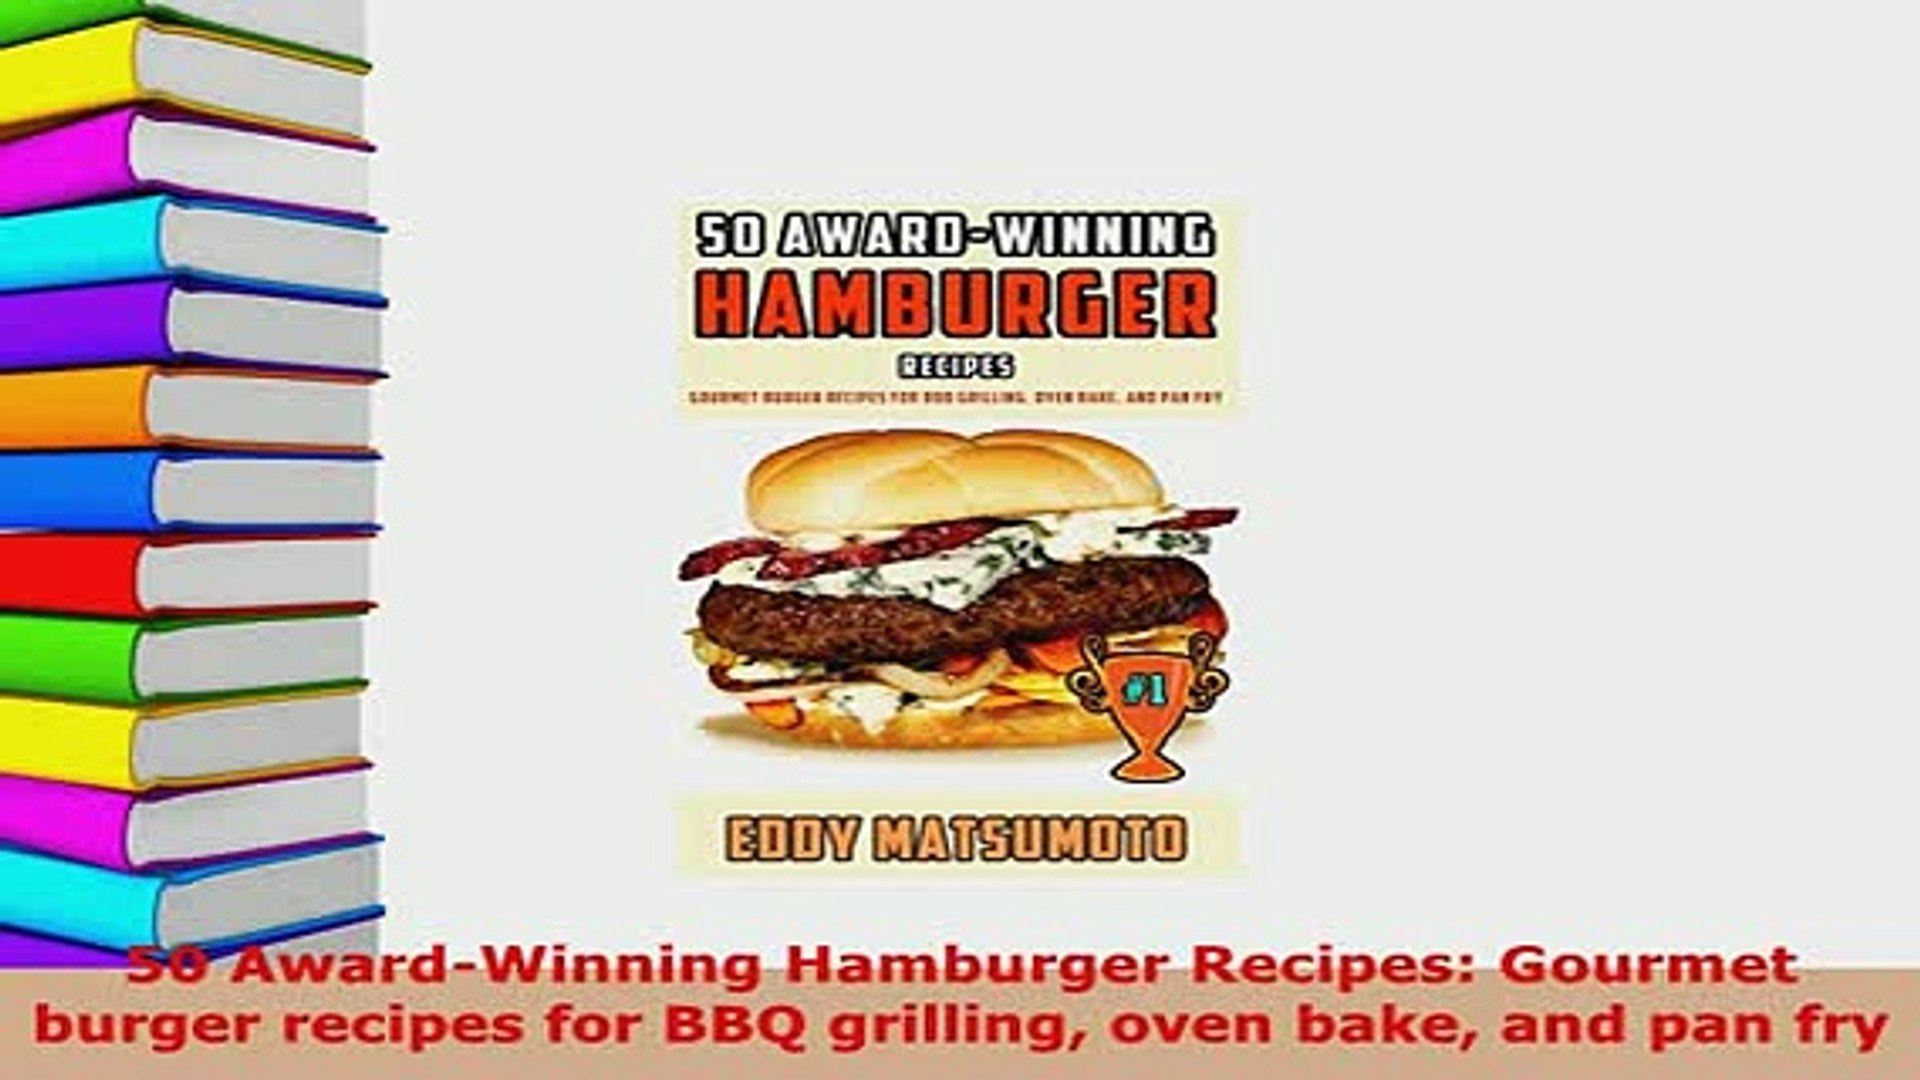 Pdf 50 Awardwinning Hamburger Recipes Gourmet Burger Recipes For Bbq Grilling Oven Bake And Pdf Book Free